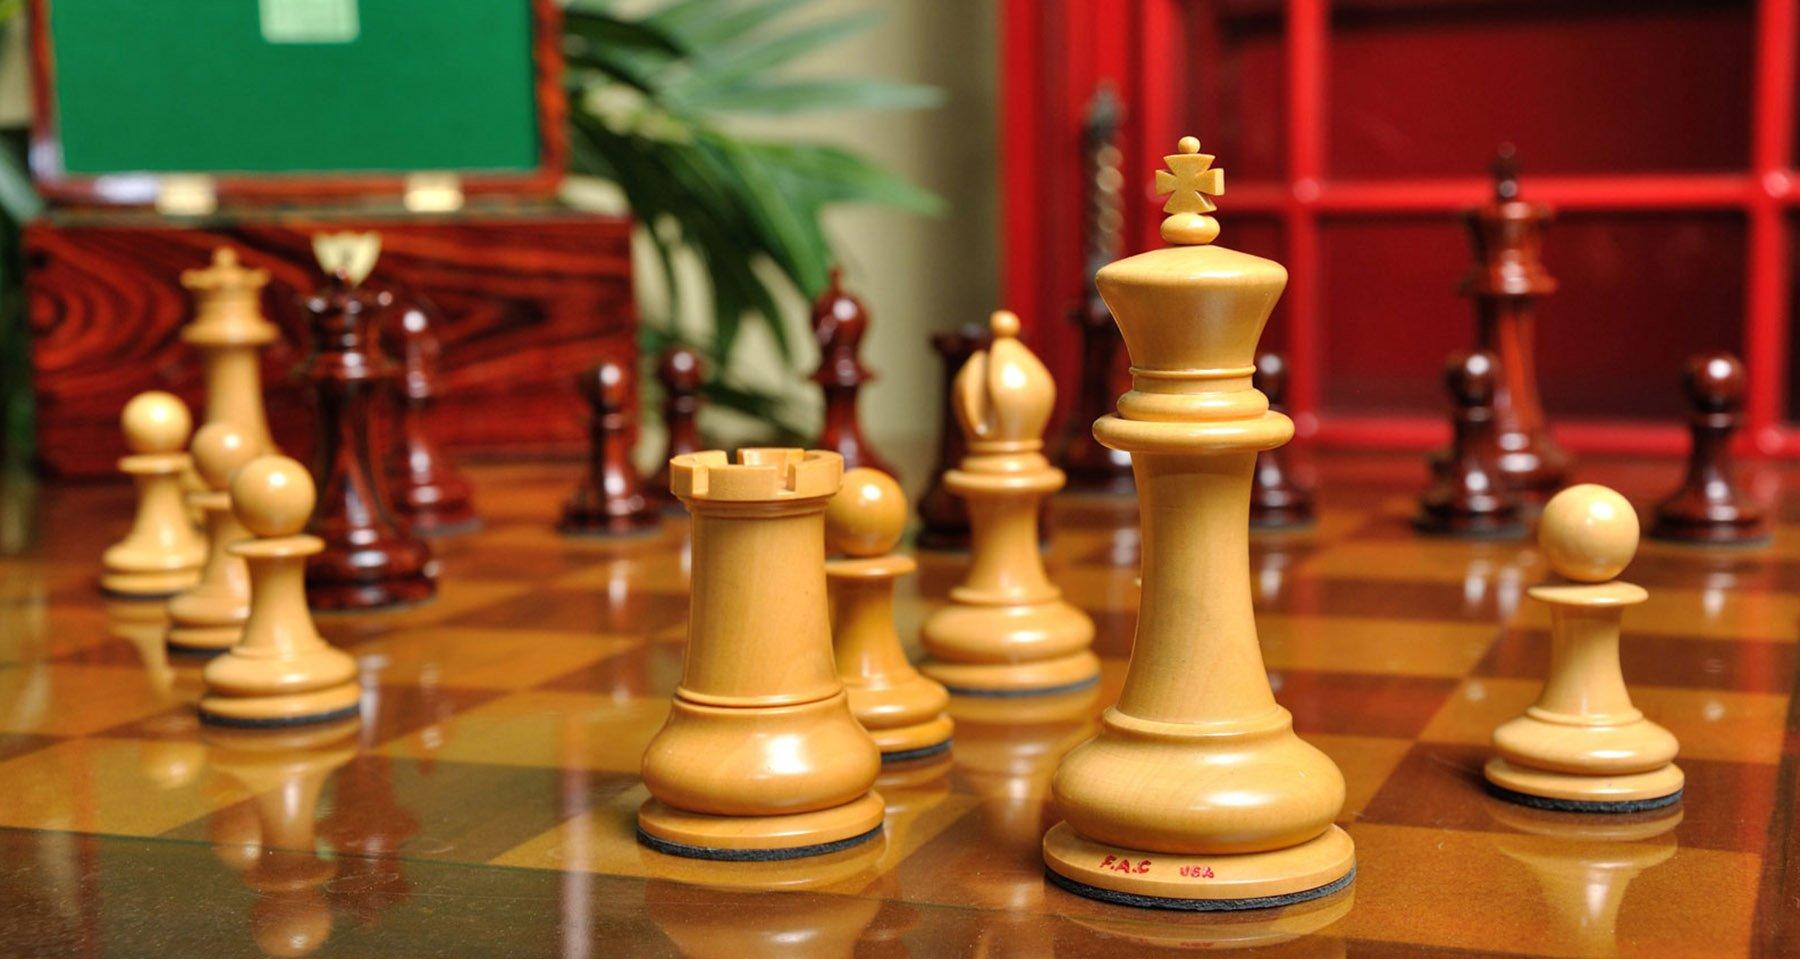 Original jaques club size 1849 staunton chessmen - The chessmen chess set ...